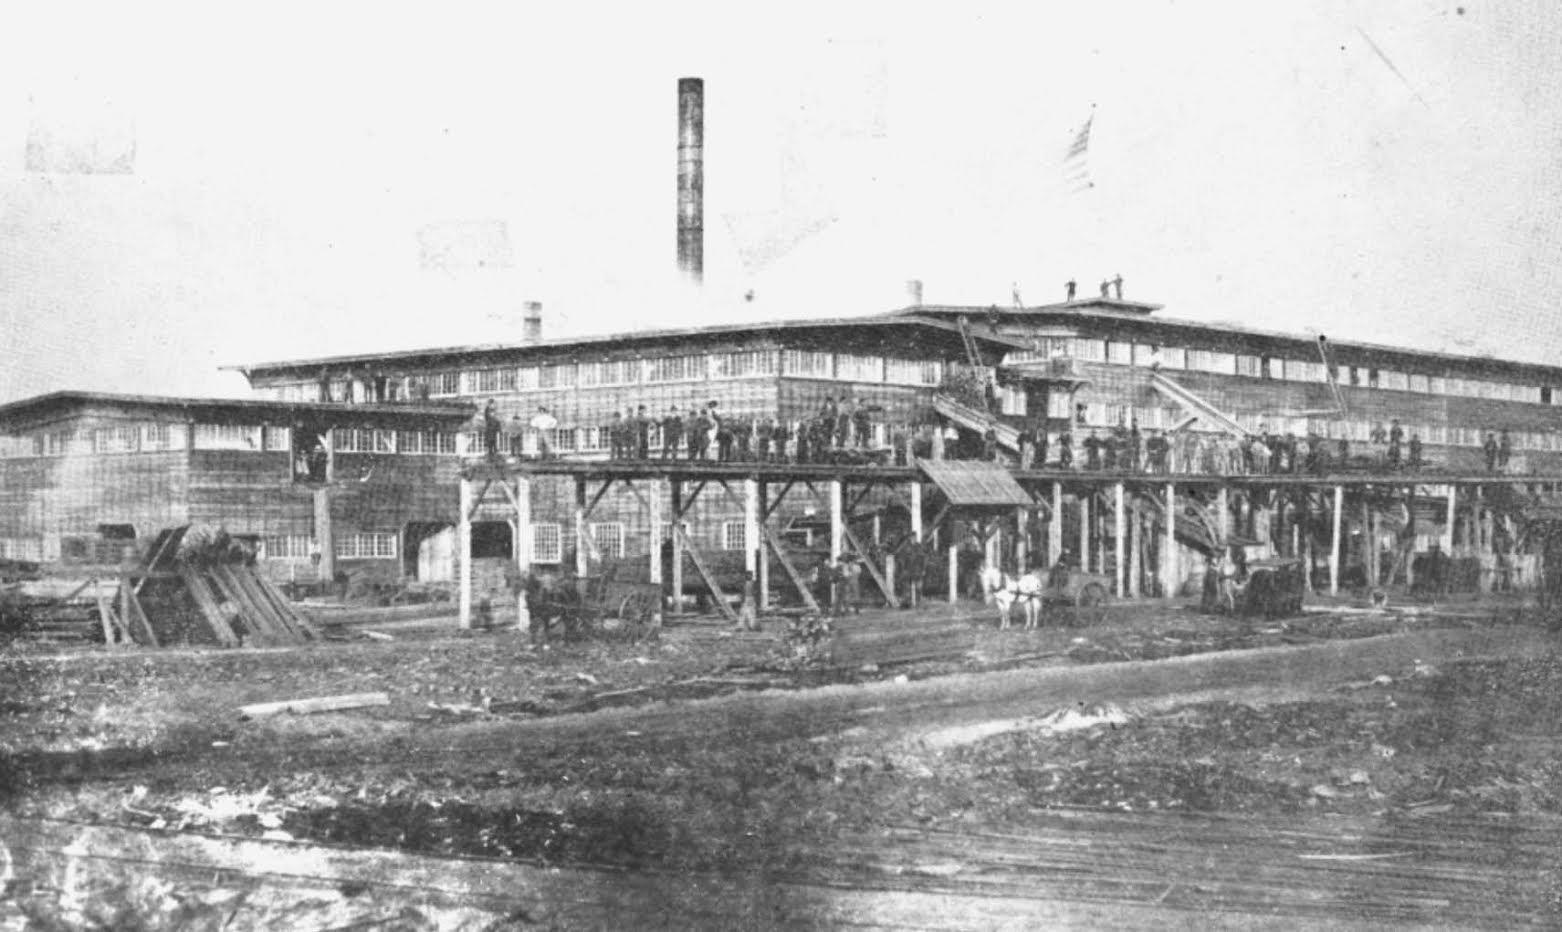 Photo of woodenware factory in Peshtigo before the fire of 1871